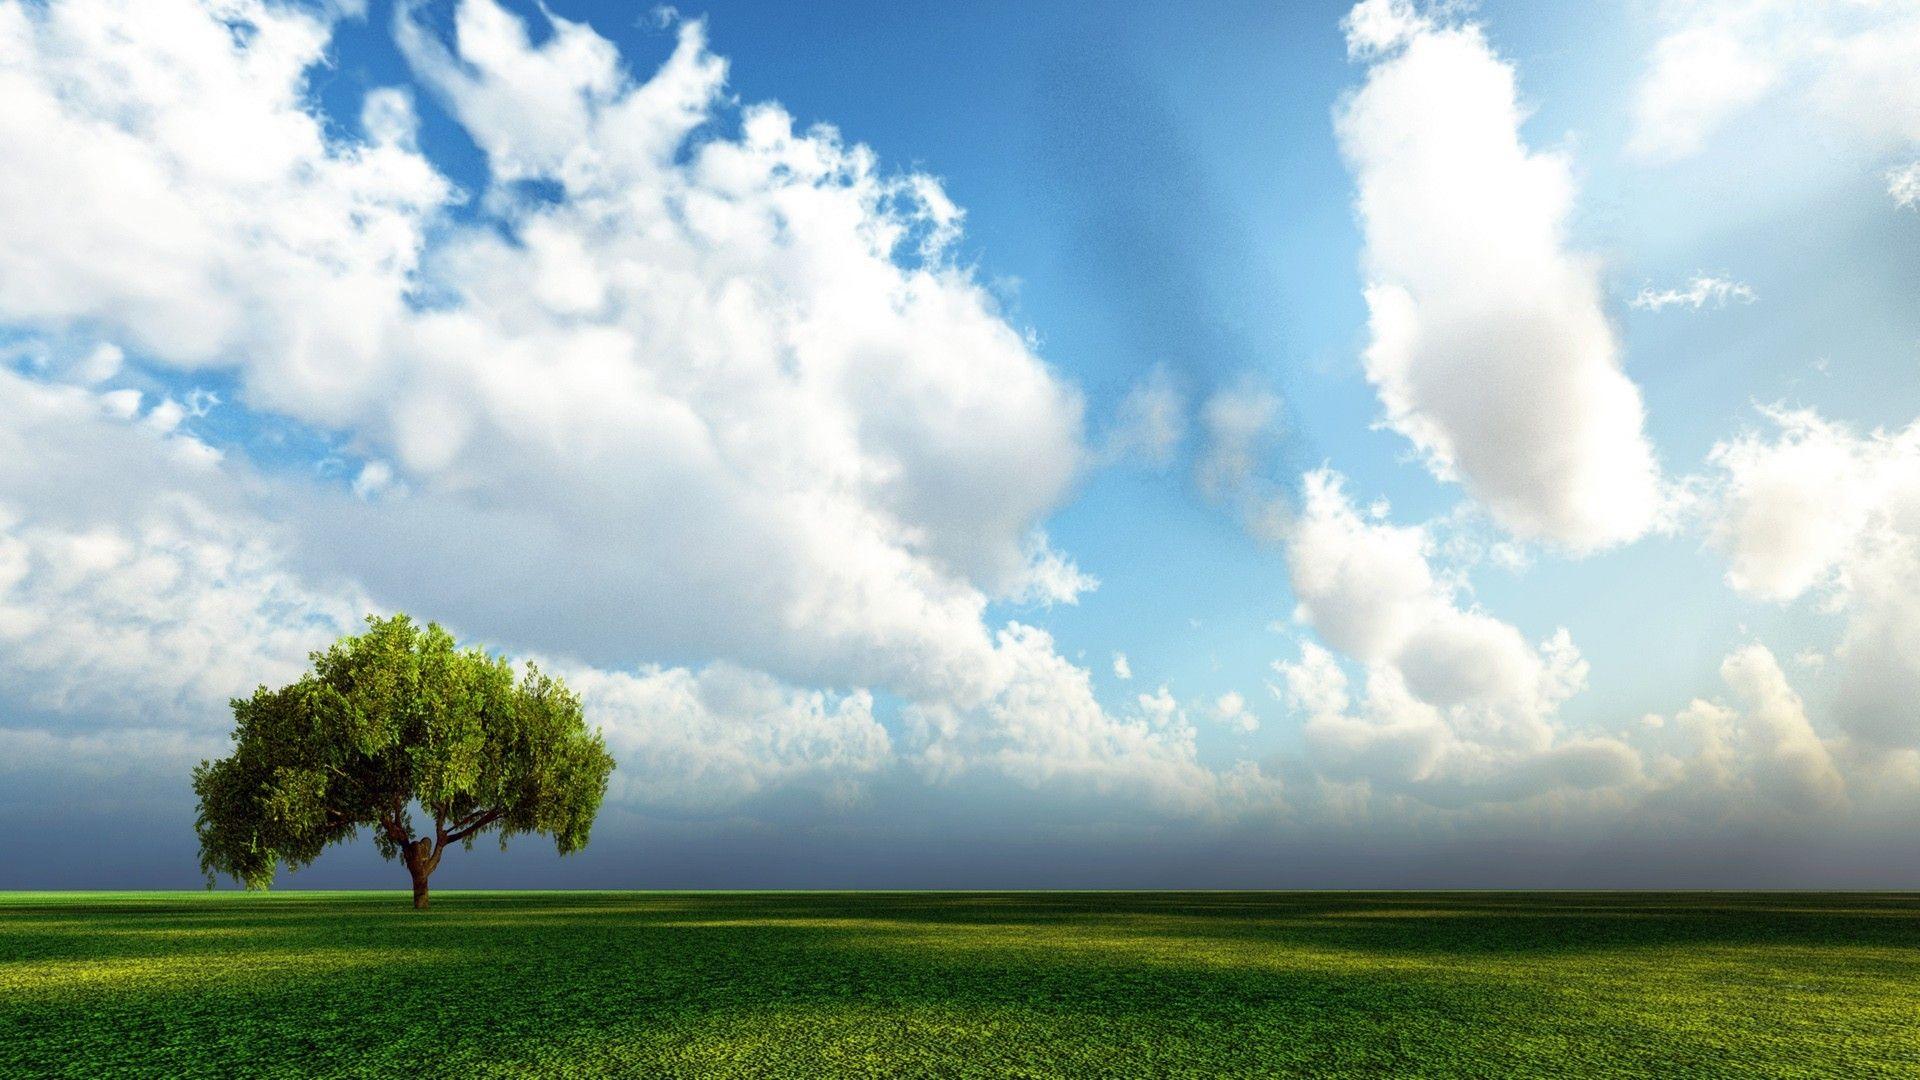 Download 3D Nature Image.